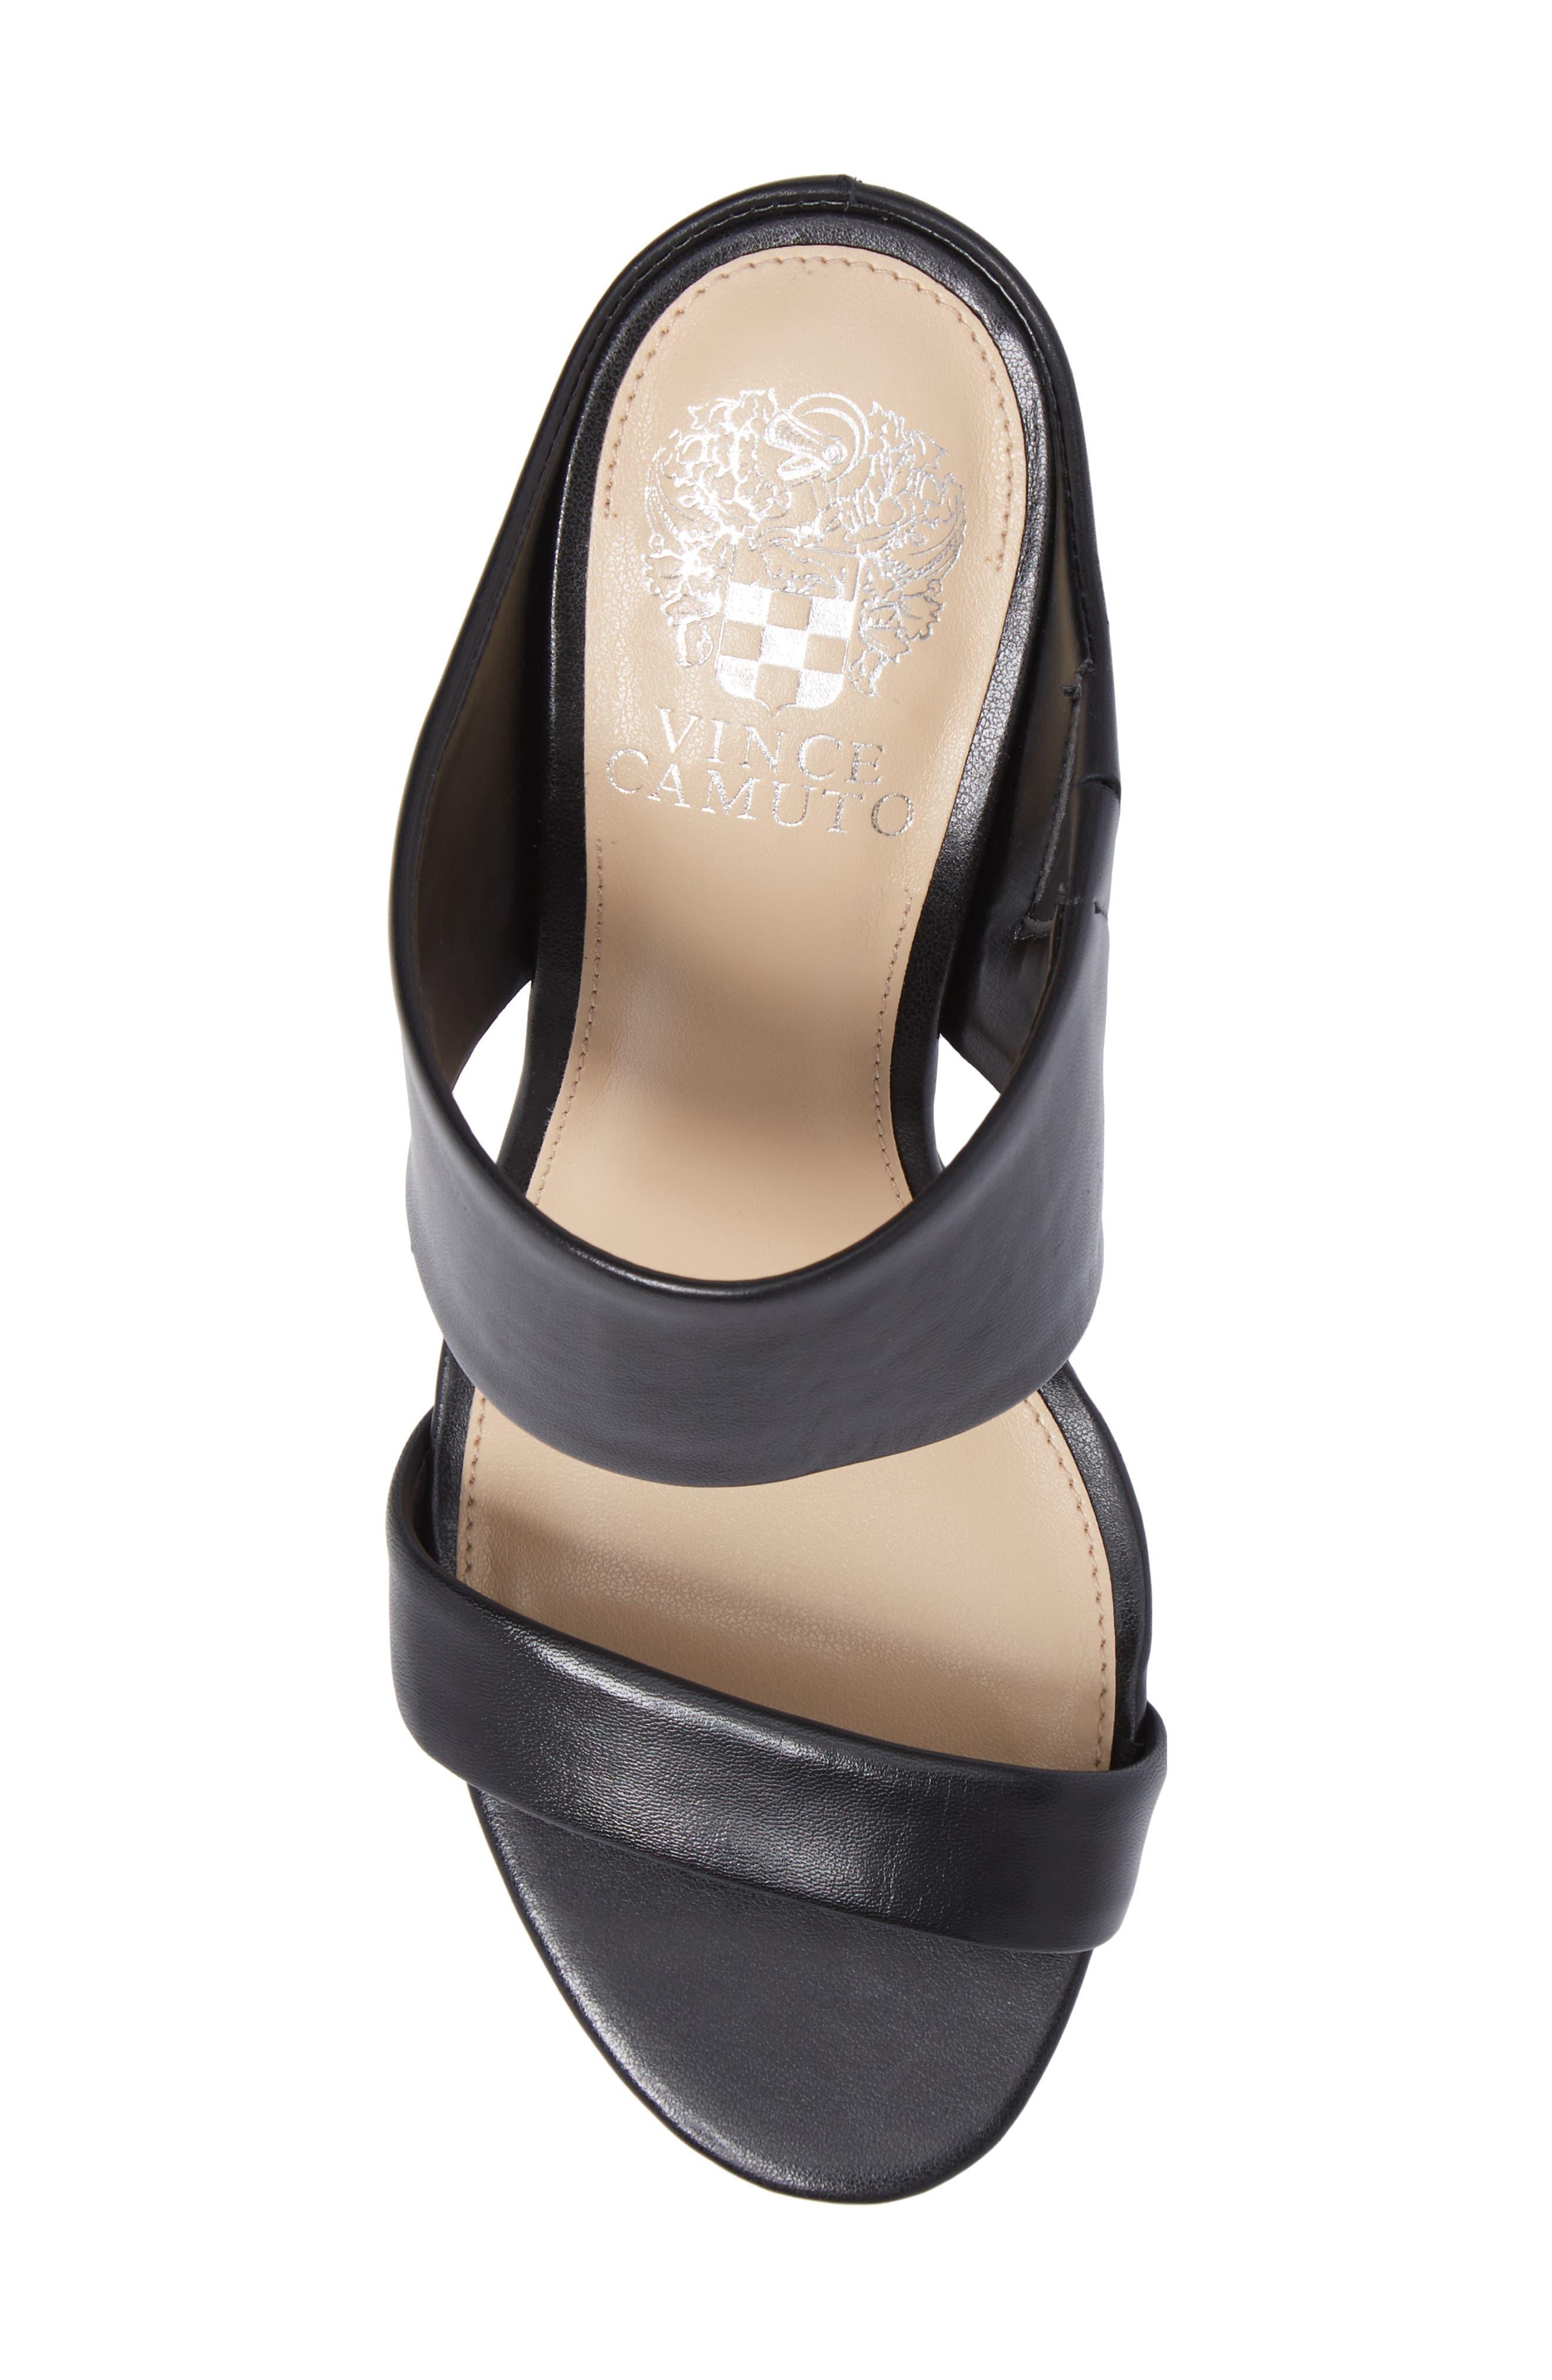 Navinta Sandal,                             Alternate thumbnail 5, color,                             Black Nappa Leather